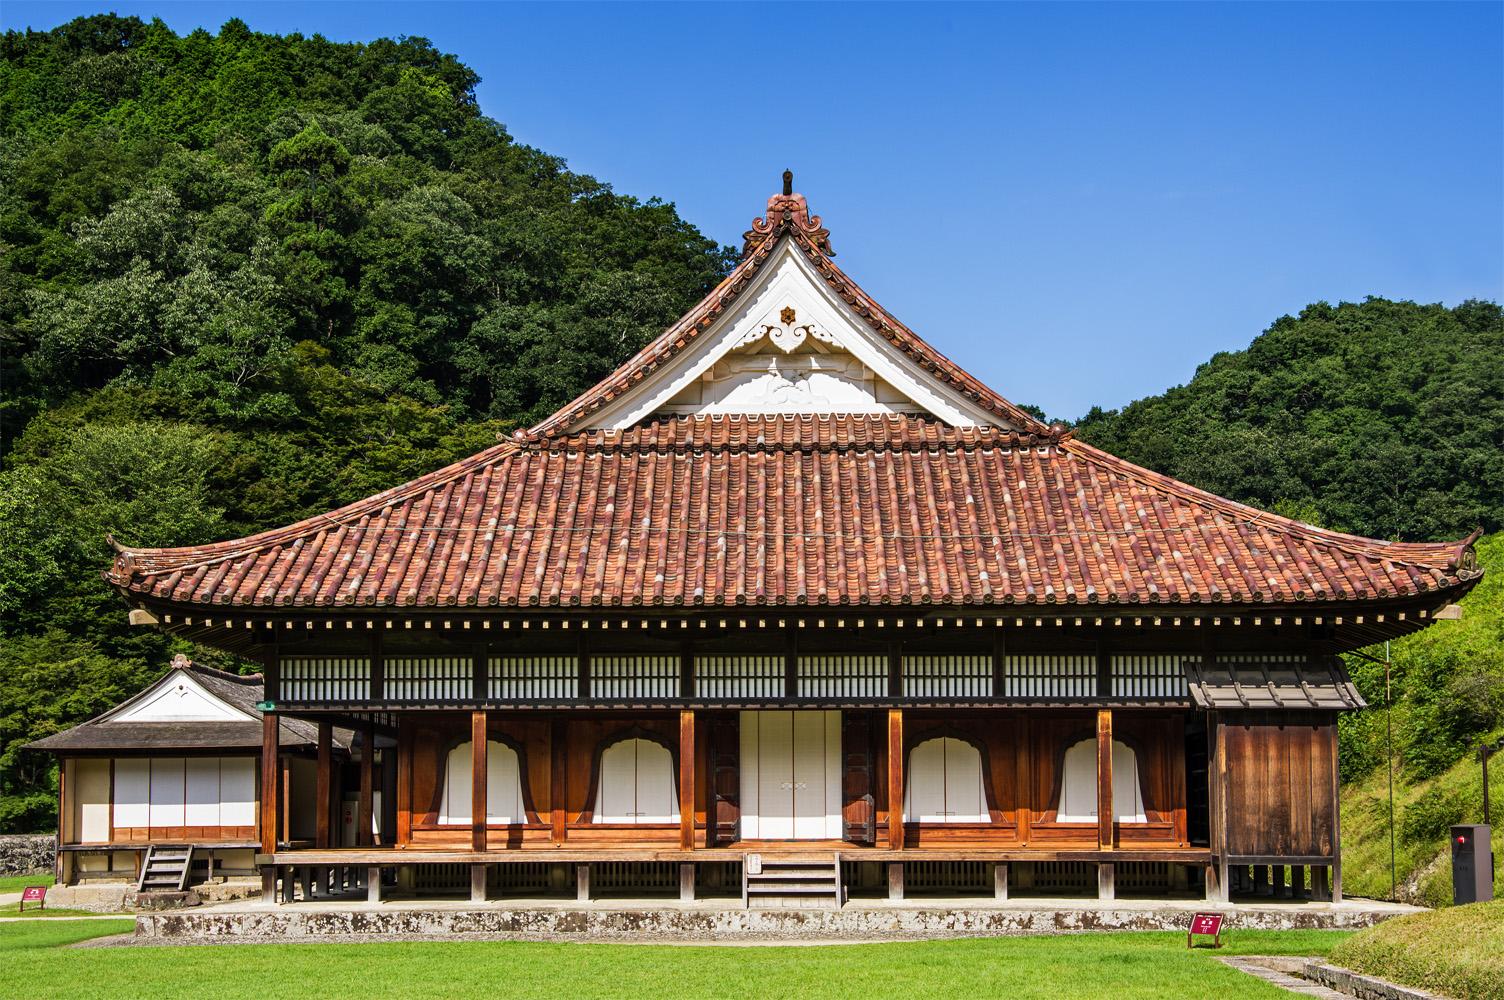 旧閑谷学校|THE GATE|日本の旅行観光マガジン・観光旅行情報掲載